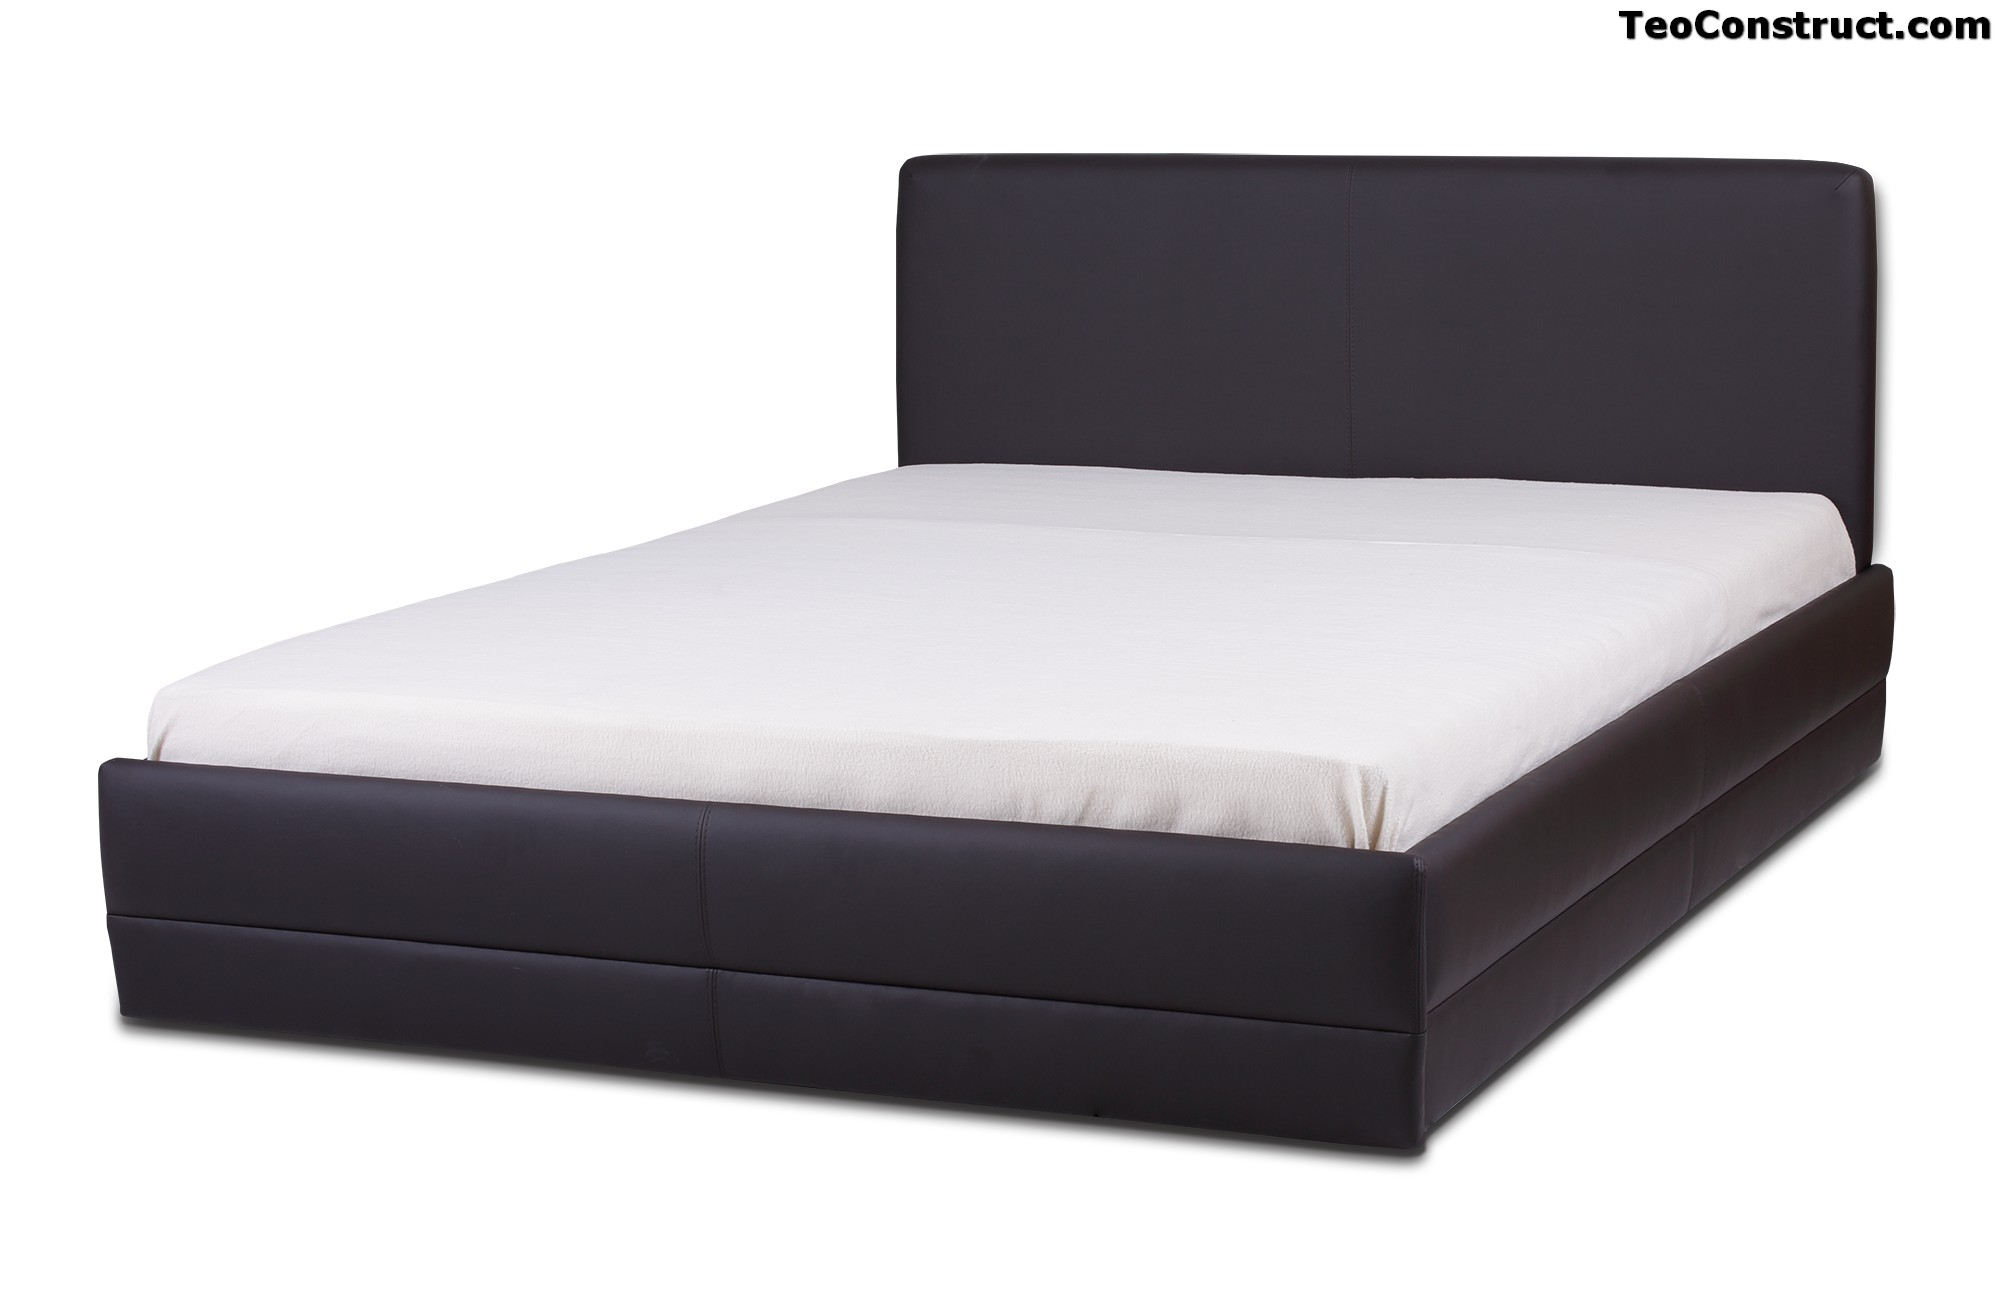 Seturi de dormitoare ieftine Toledo05